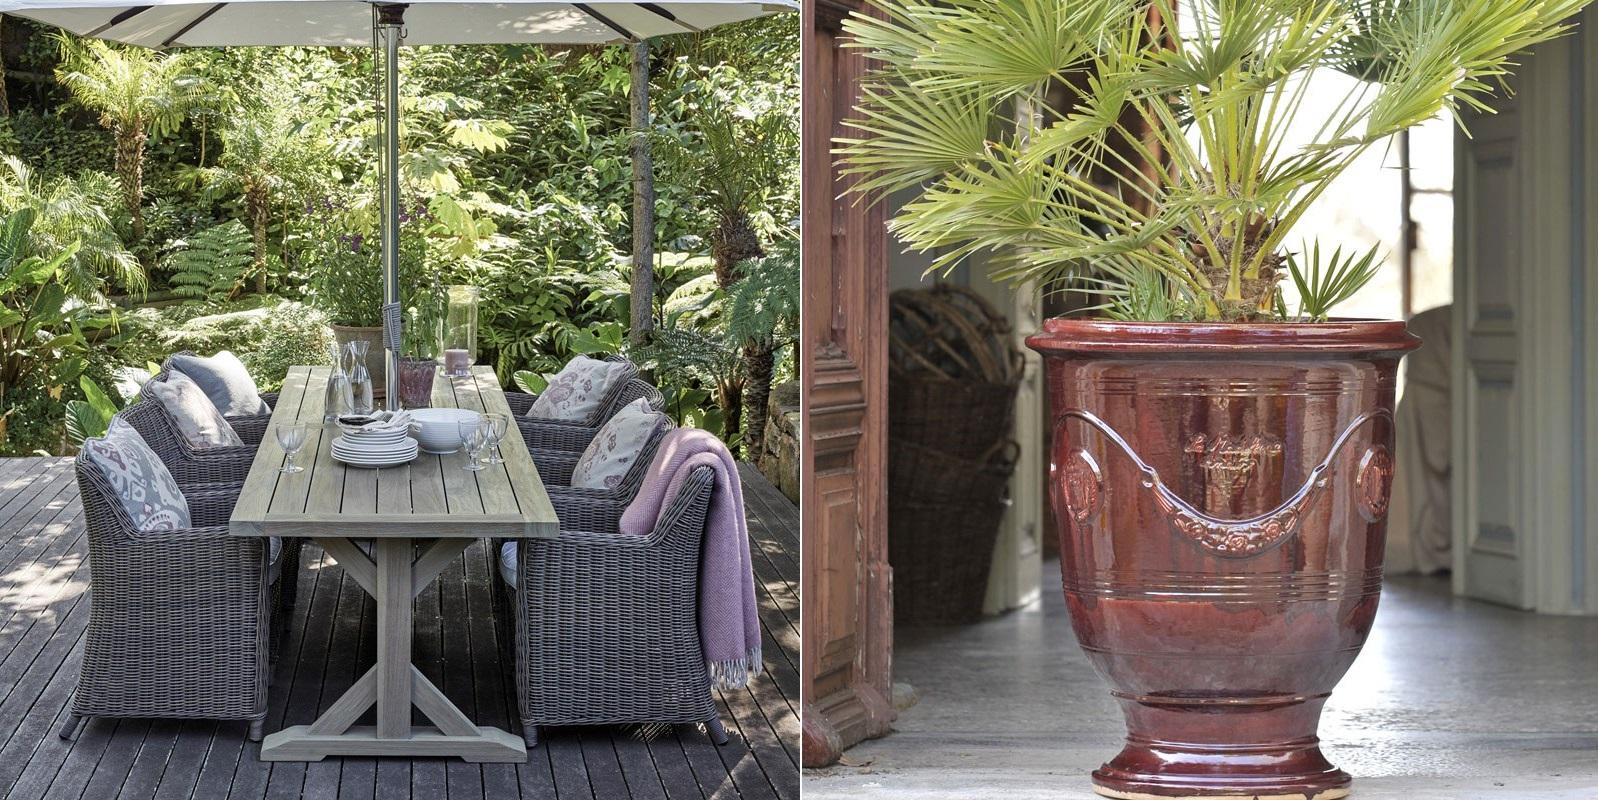 Amenajare terasa mobilier la maison stil tropical